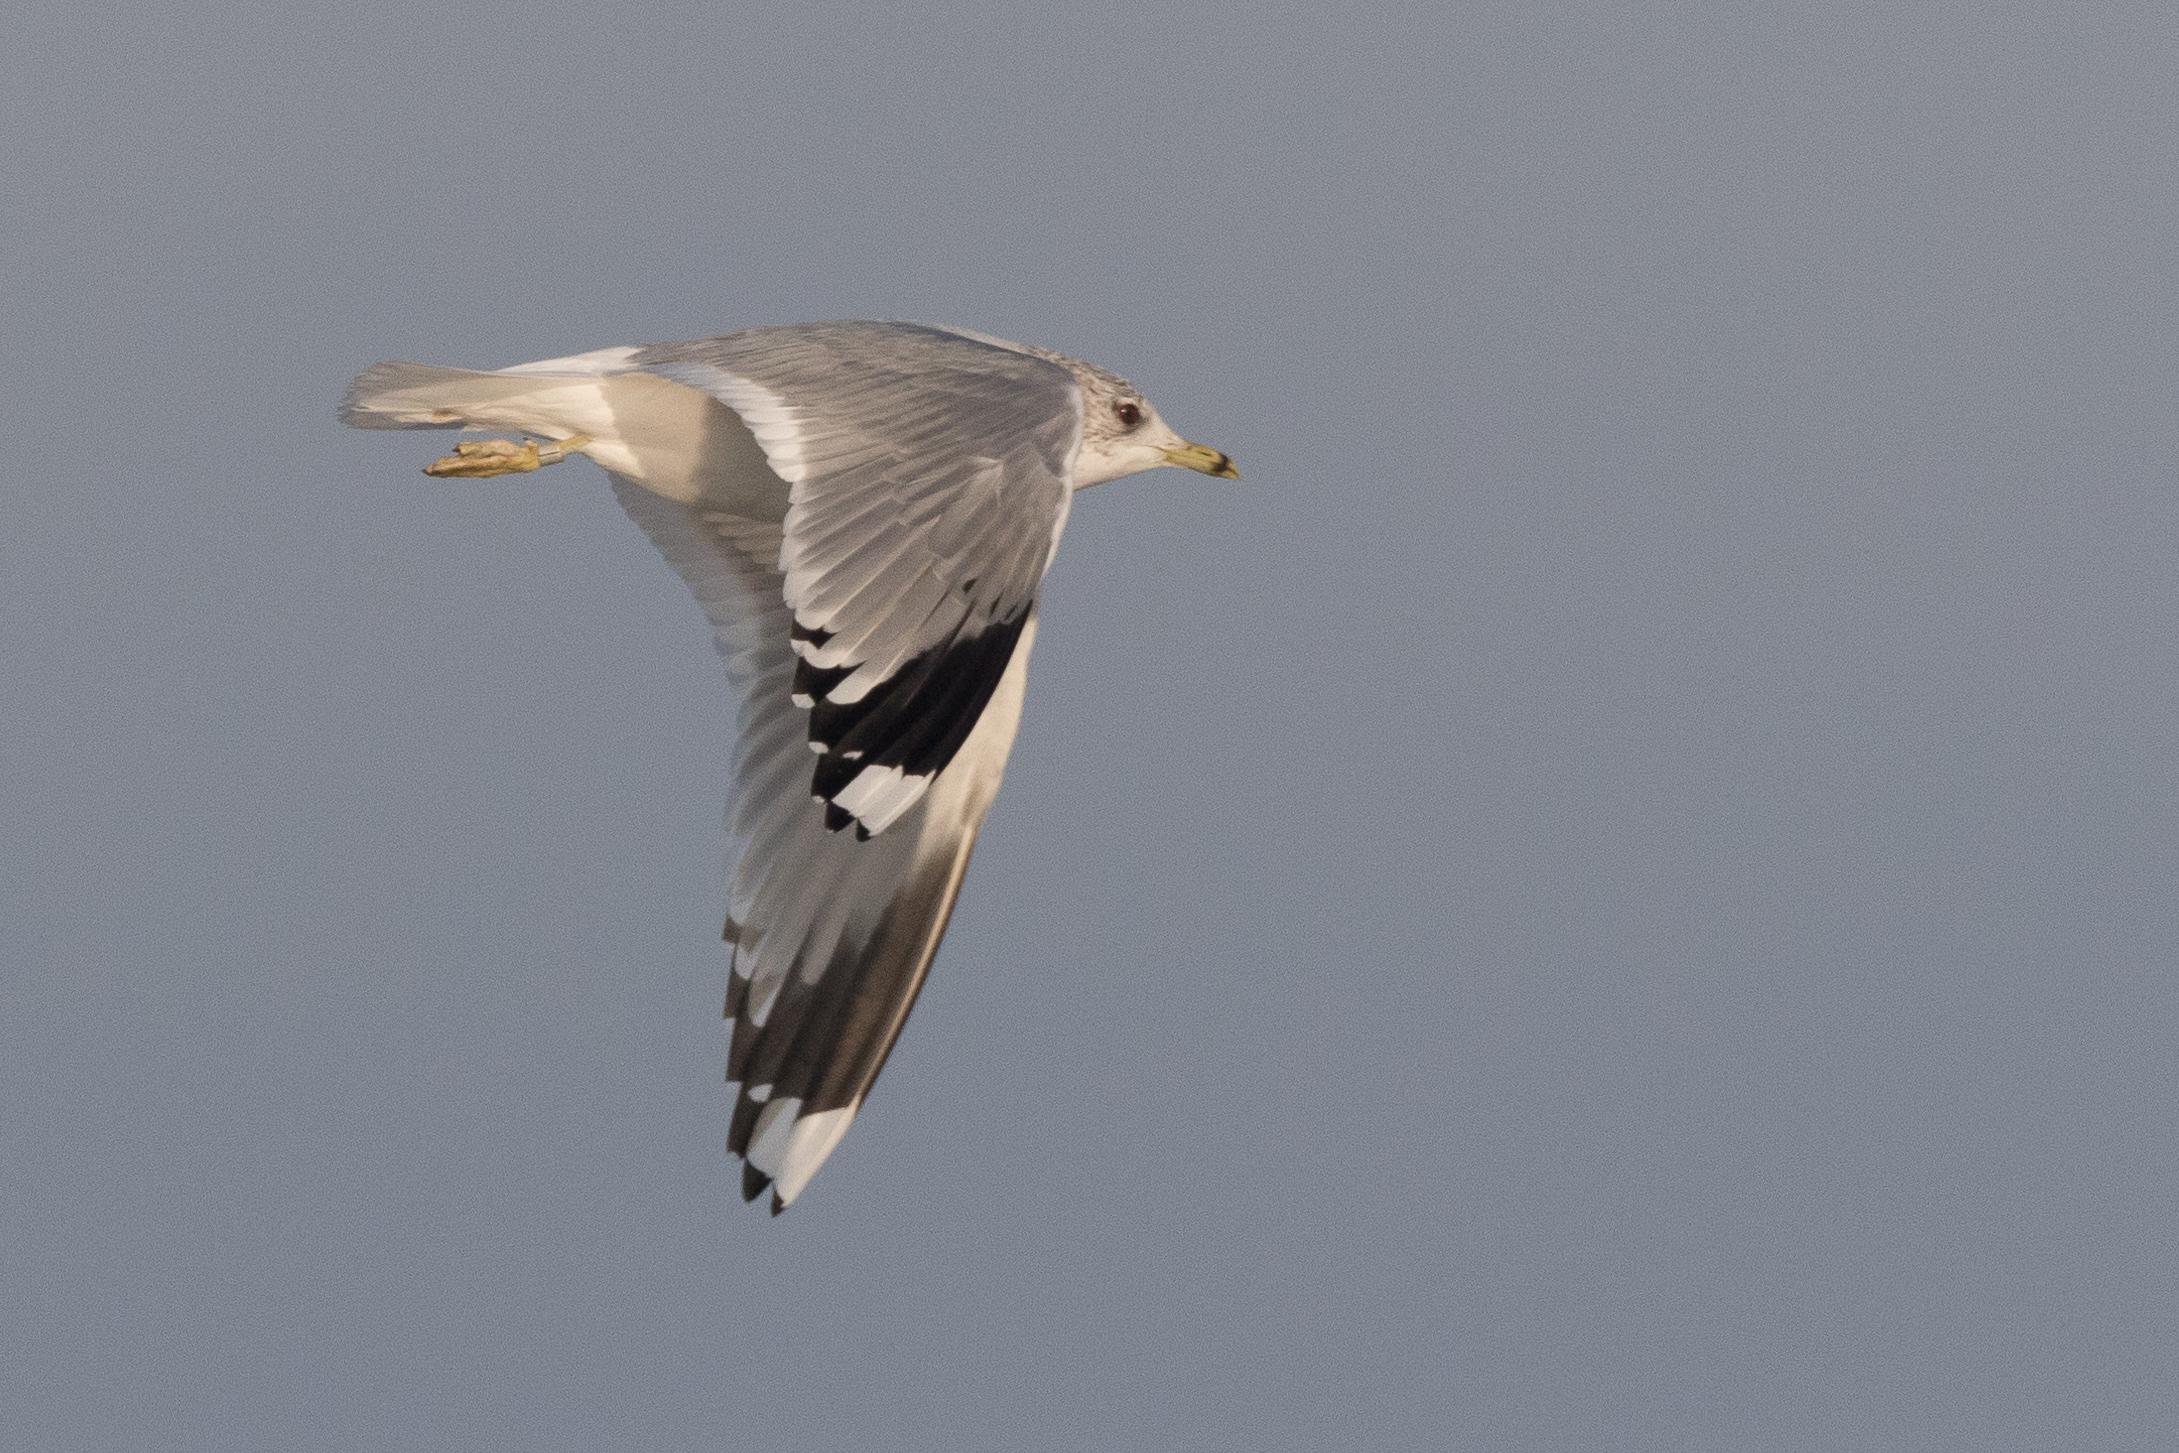 20170121-Common Gull Adult-10.jpg